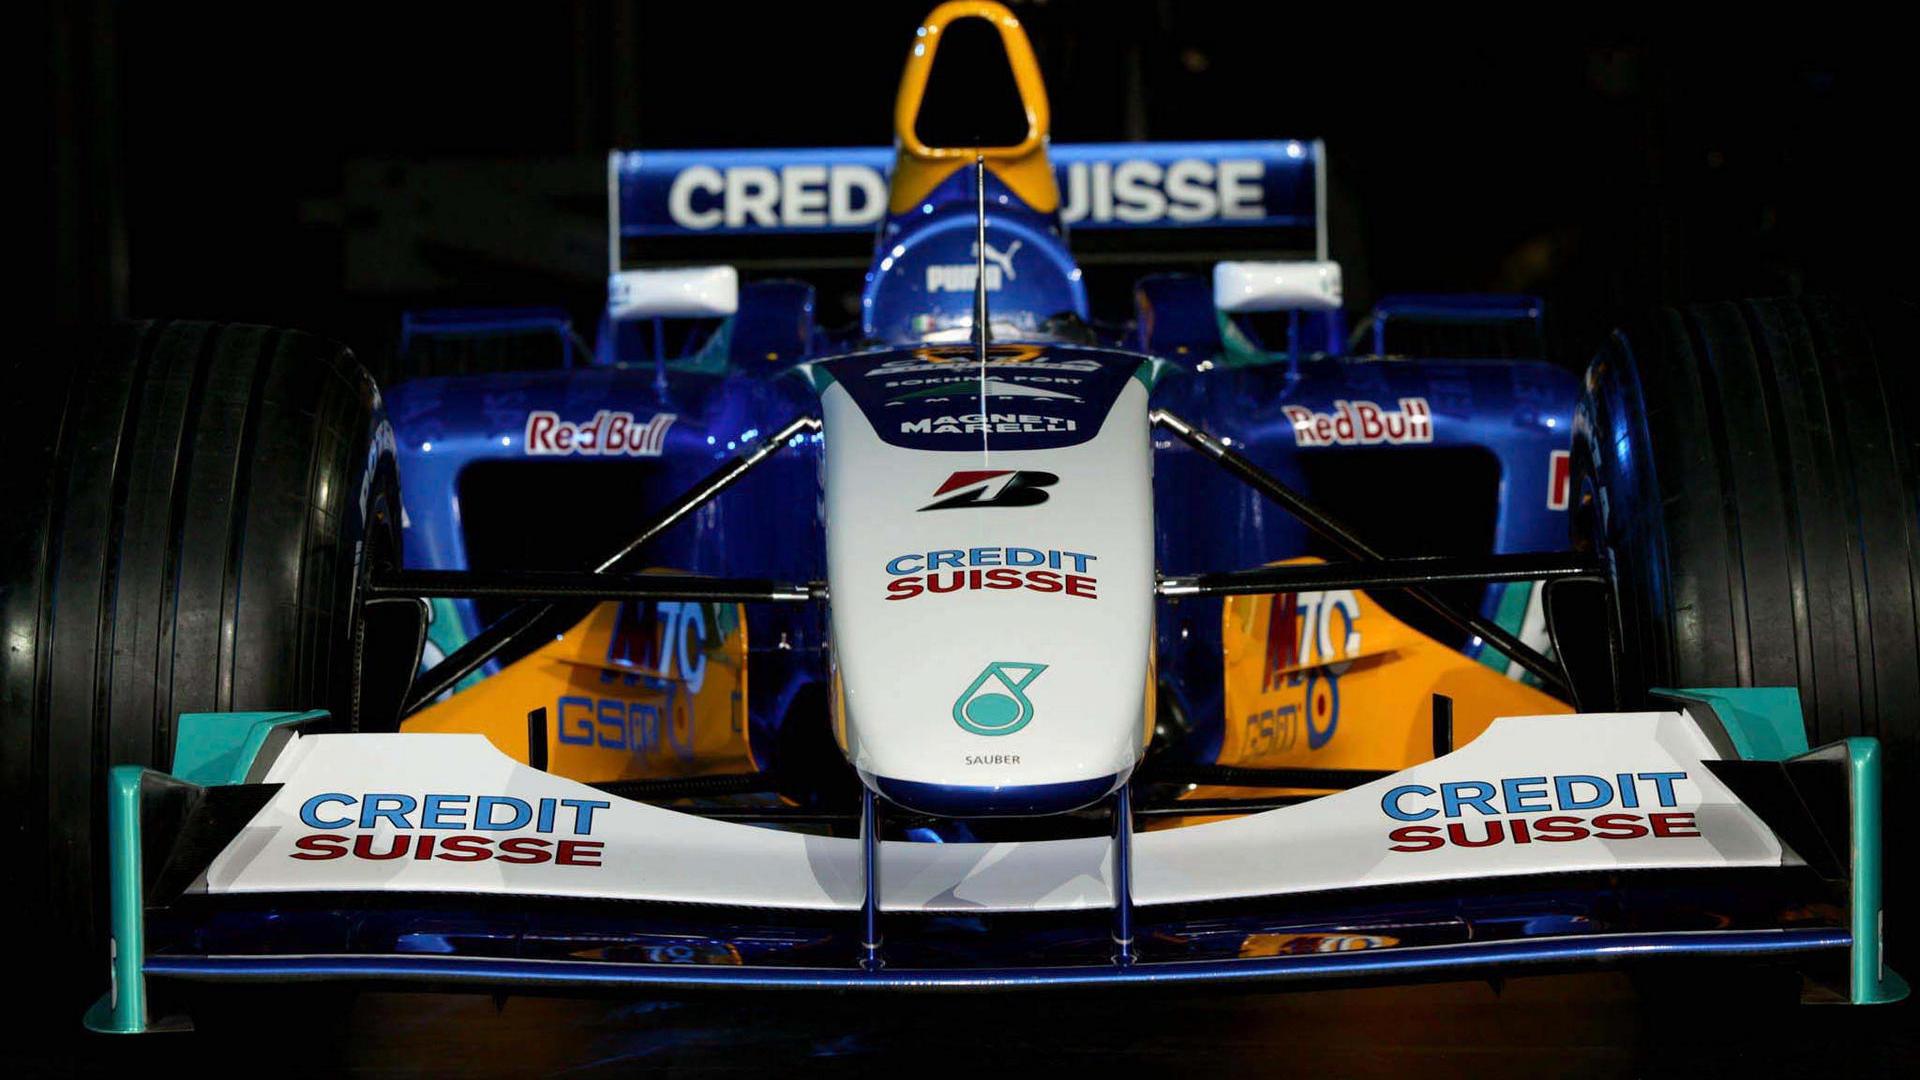 Hd Wallpapers 2005 Formula 1 Car Launches: HD Wallpapers 2004 Formula 1 Car Launches